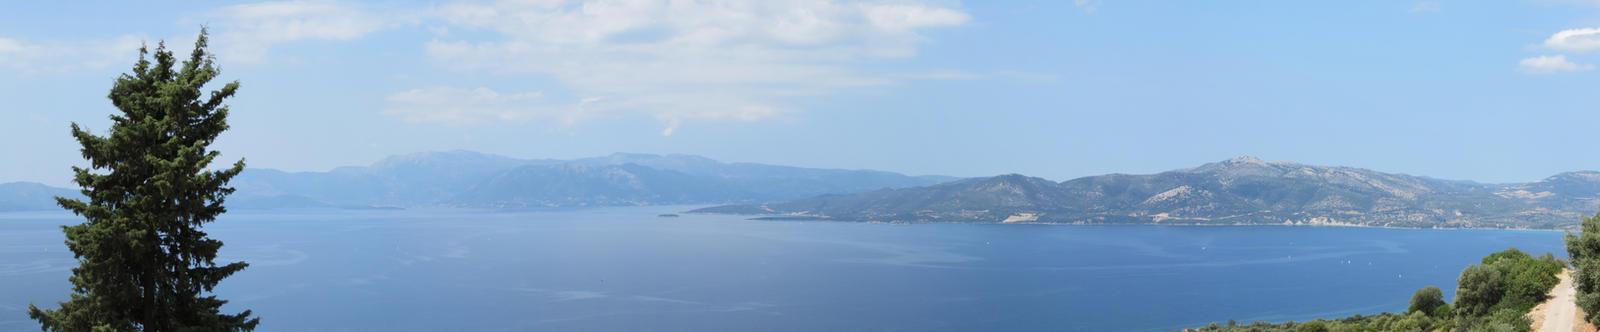 panorama from st.Dimitrios monastery near Palairos by Silinde-Ar-Feiniel